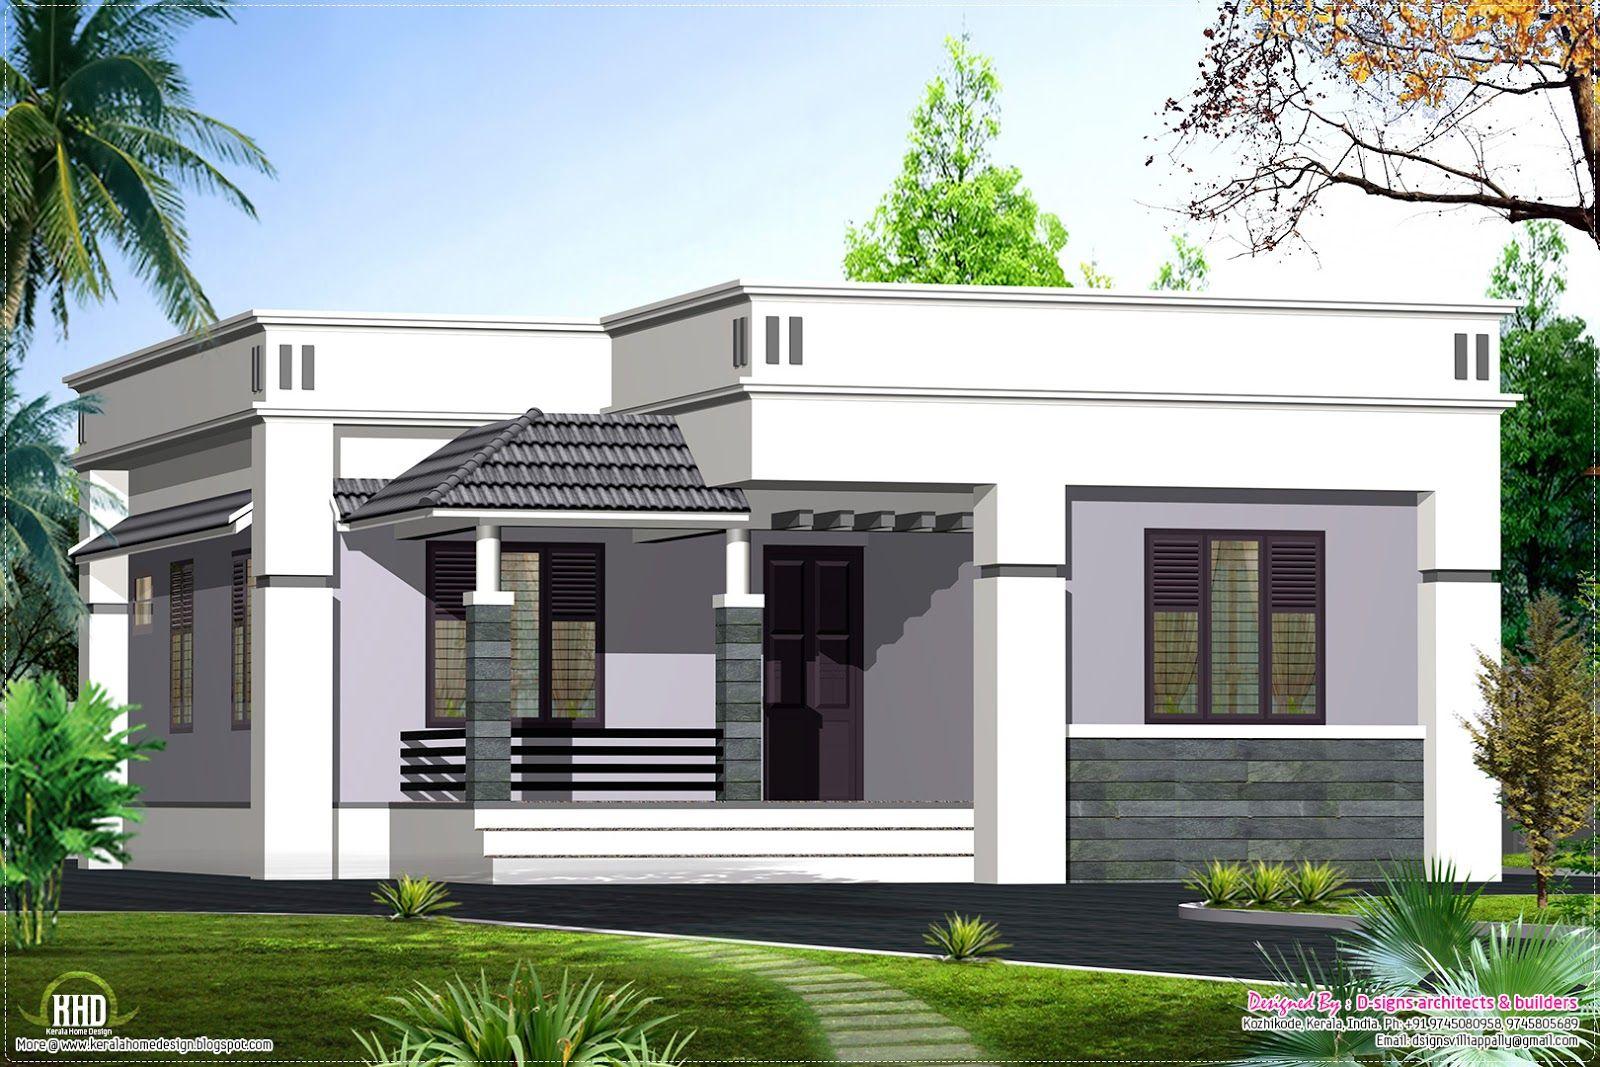 Simple 1 Storey House Design Philippines Valoblogi Com